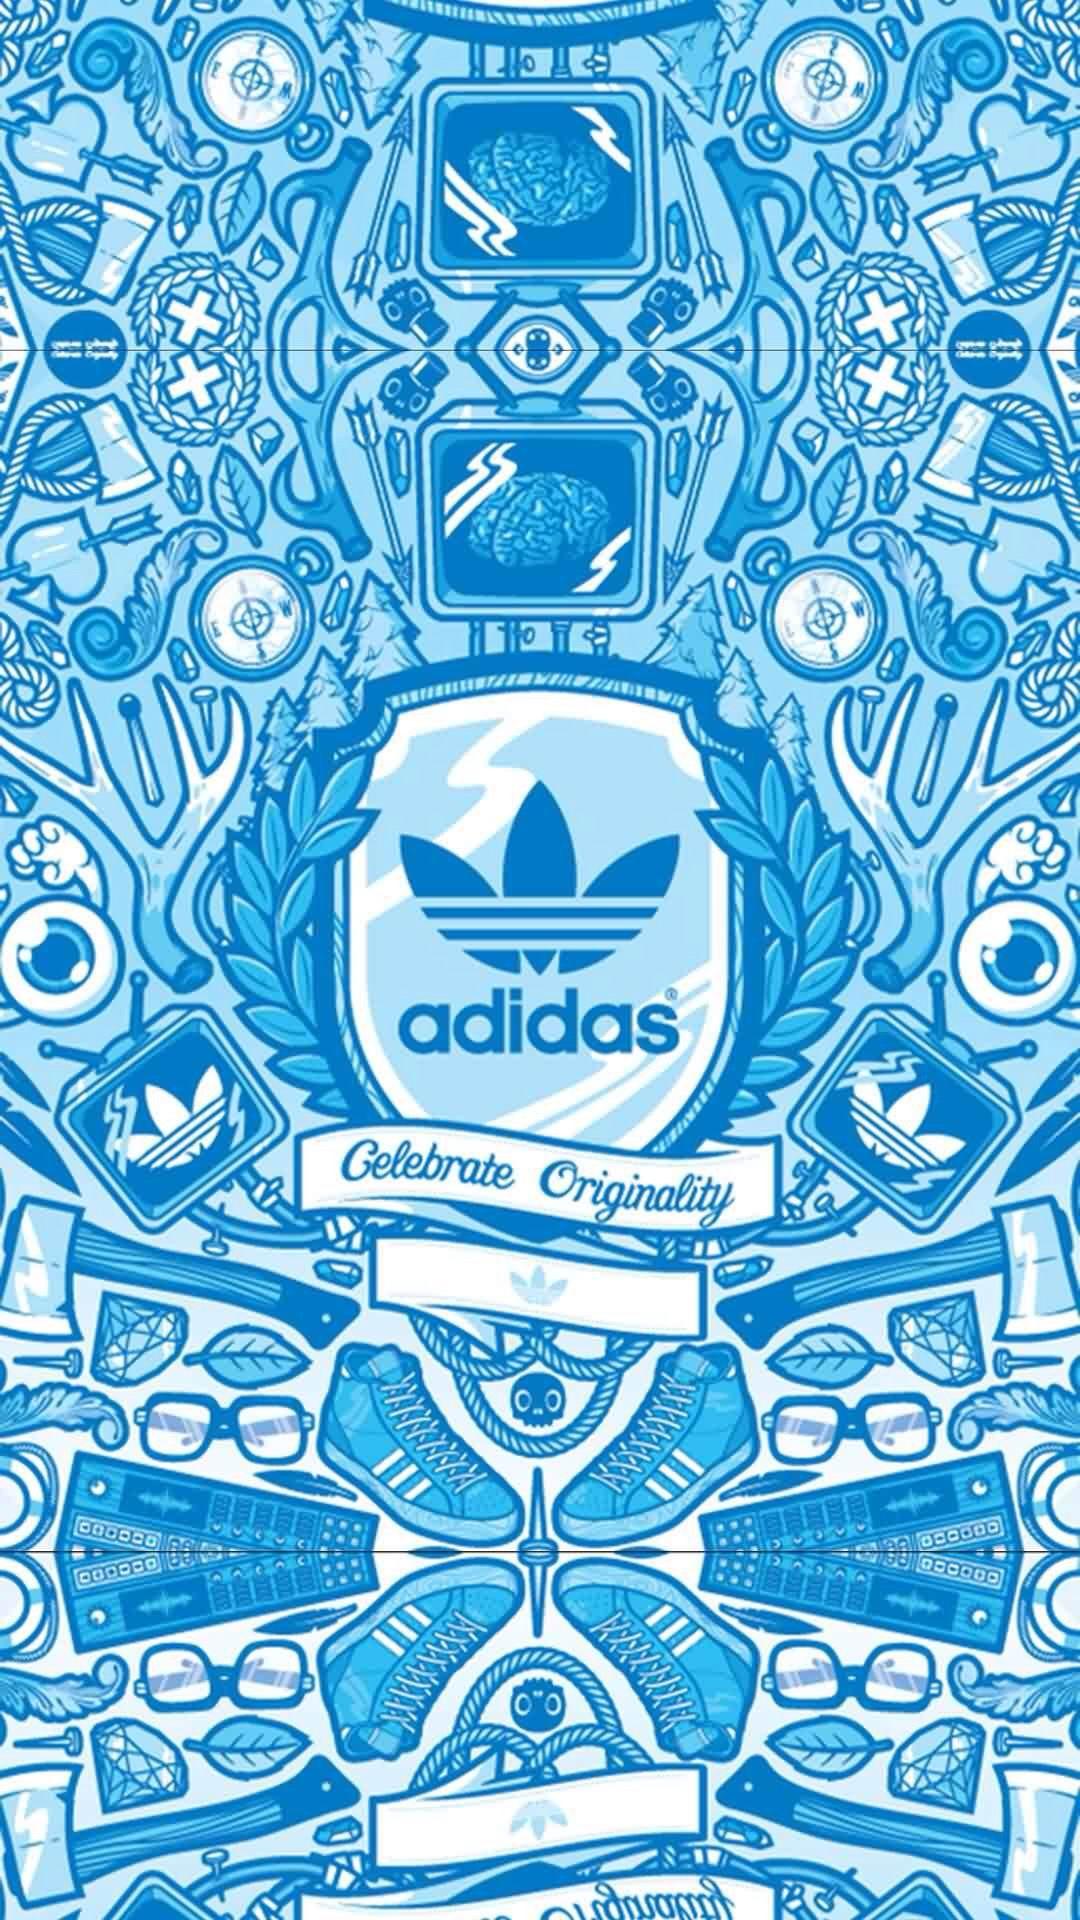 Adidas三叶草手机壁纸